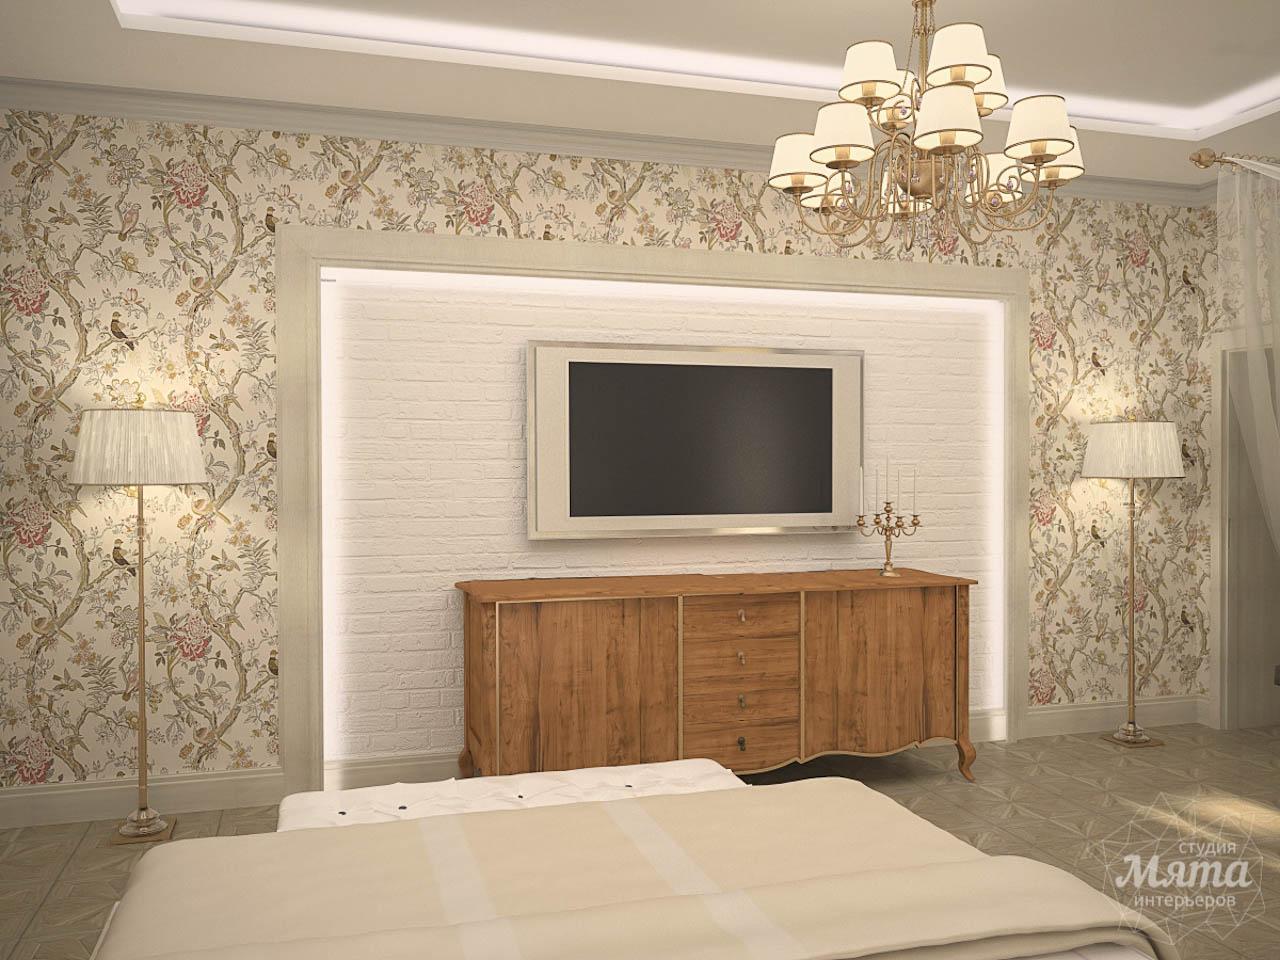 Дизайн интерьера коттеджа по ул. Ландышевая 23 img774001729